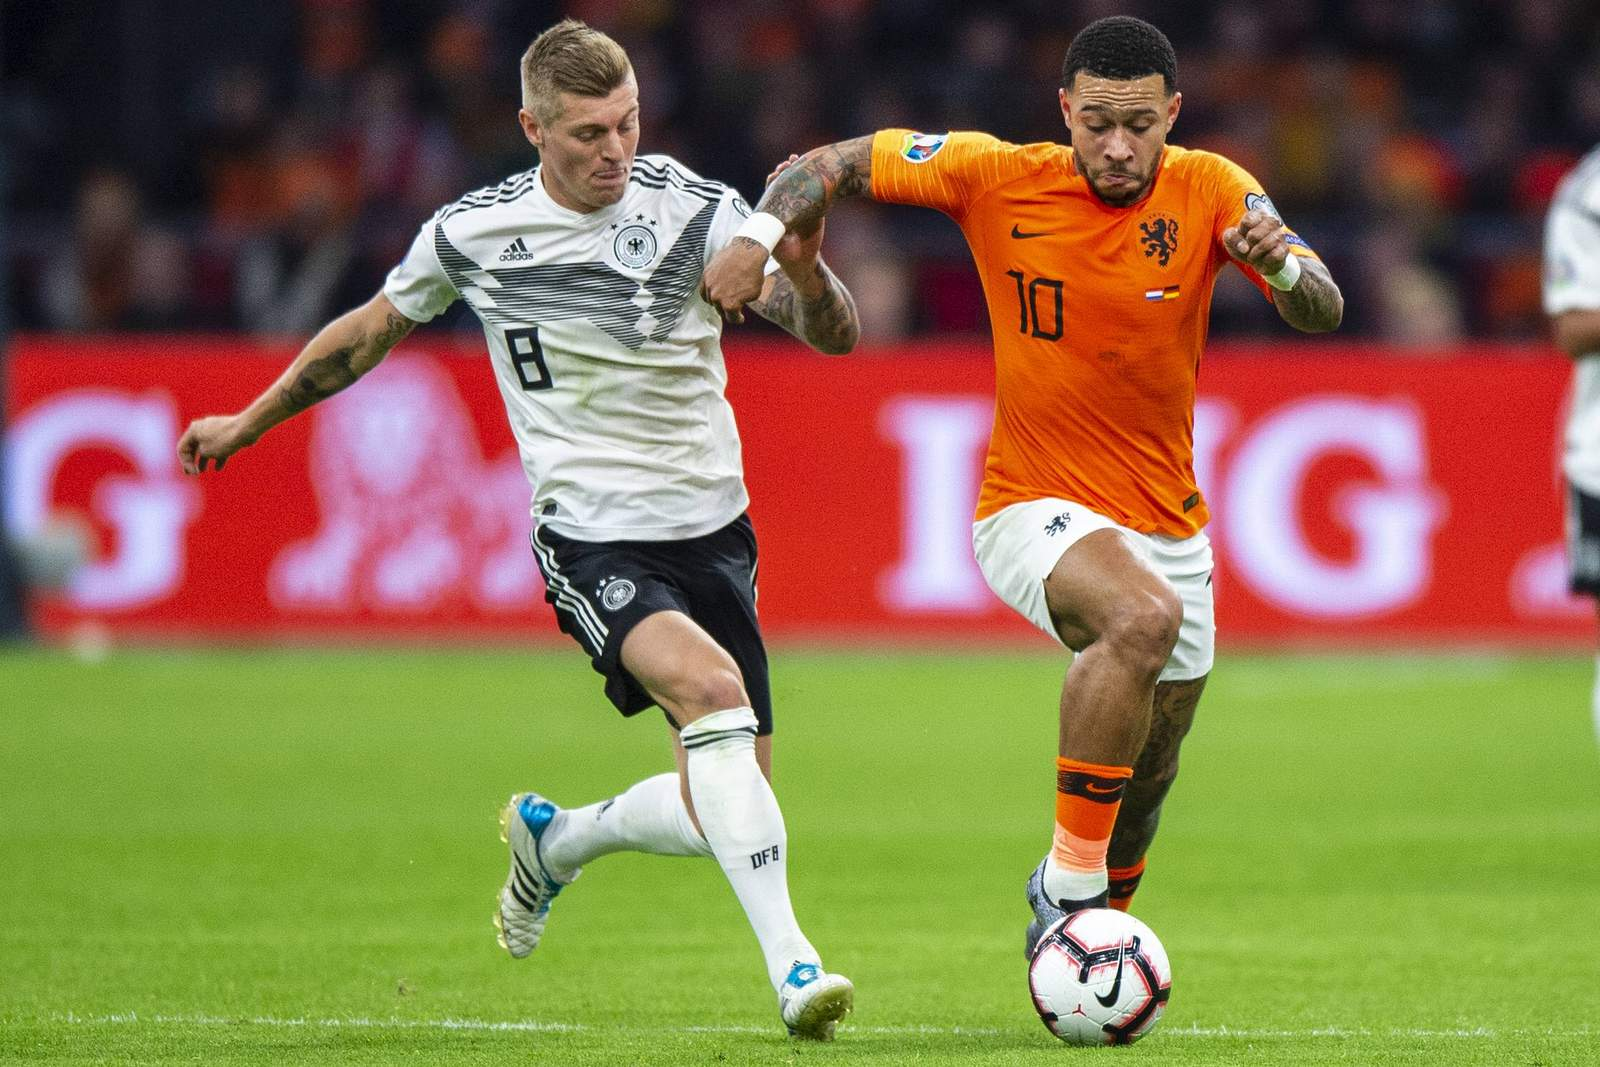 Deutschlands Toni Kroos (l.) gegen den Niederländer Memphis Depay.